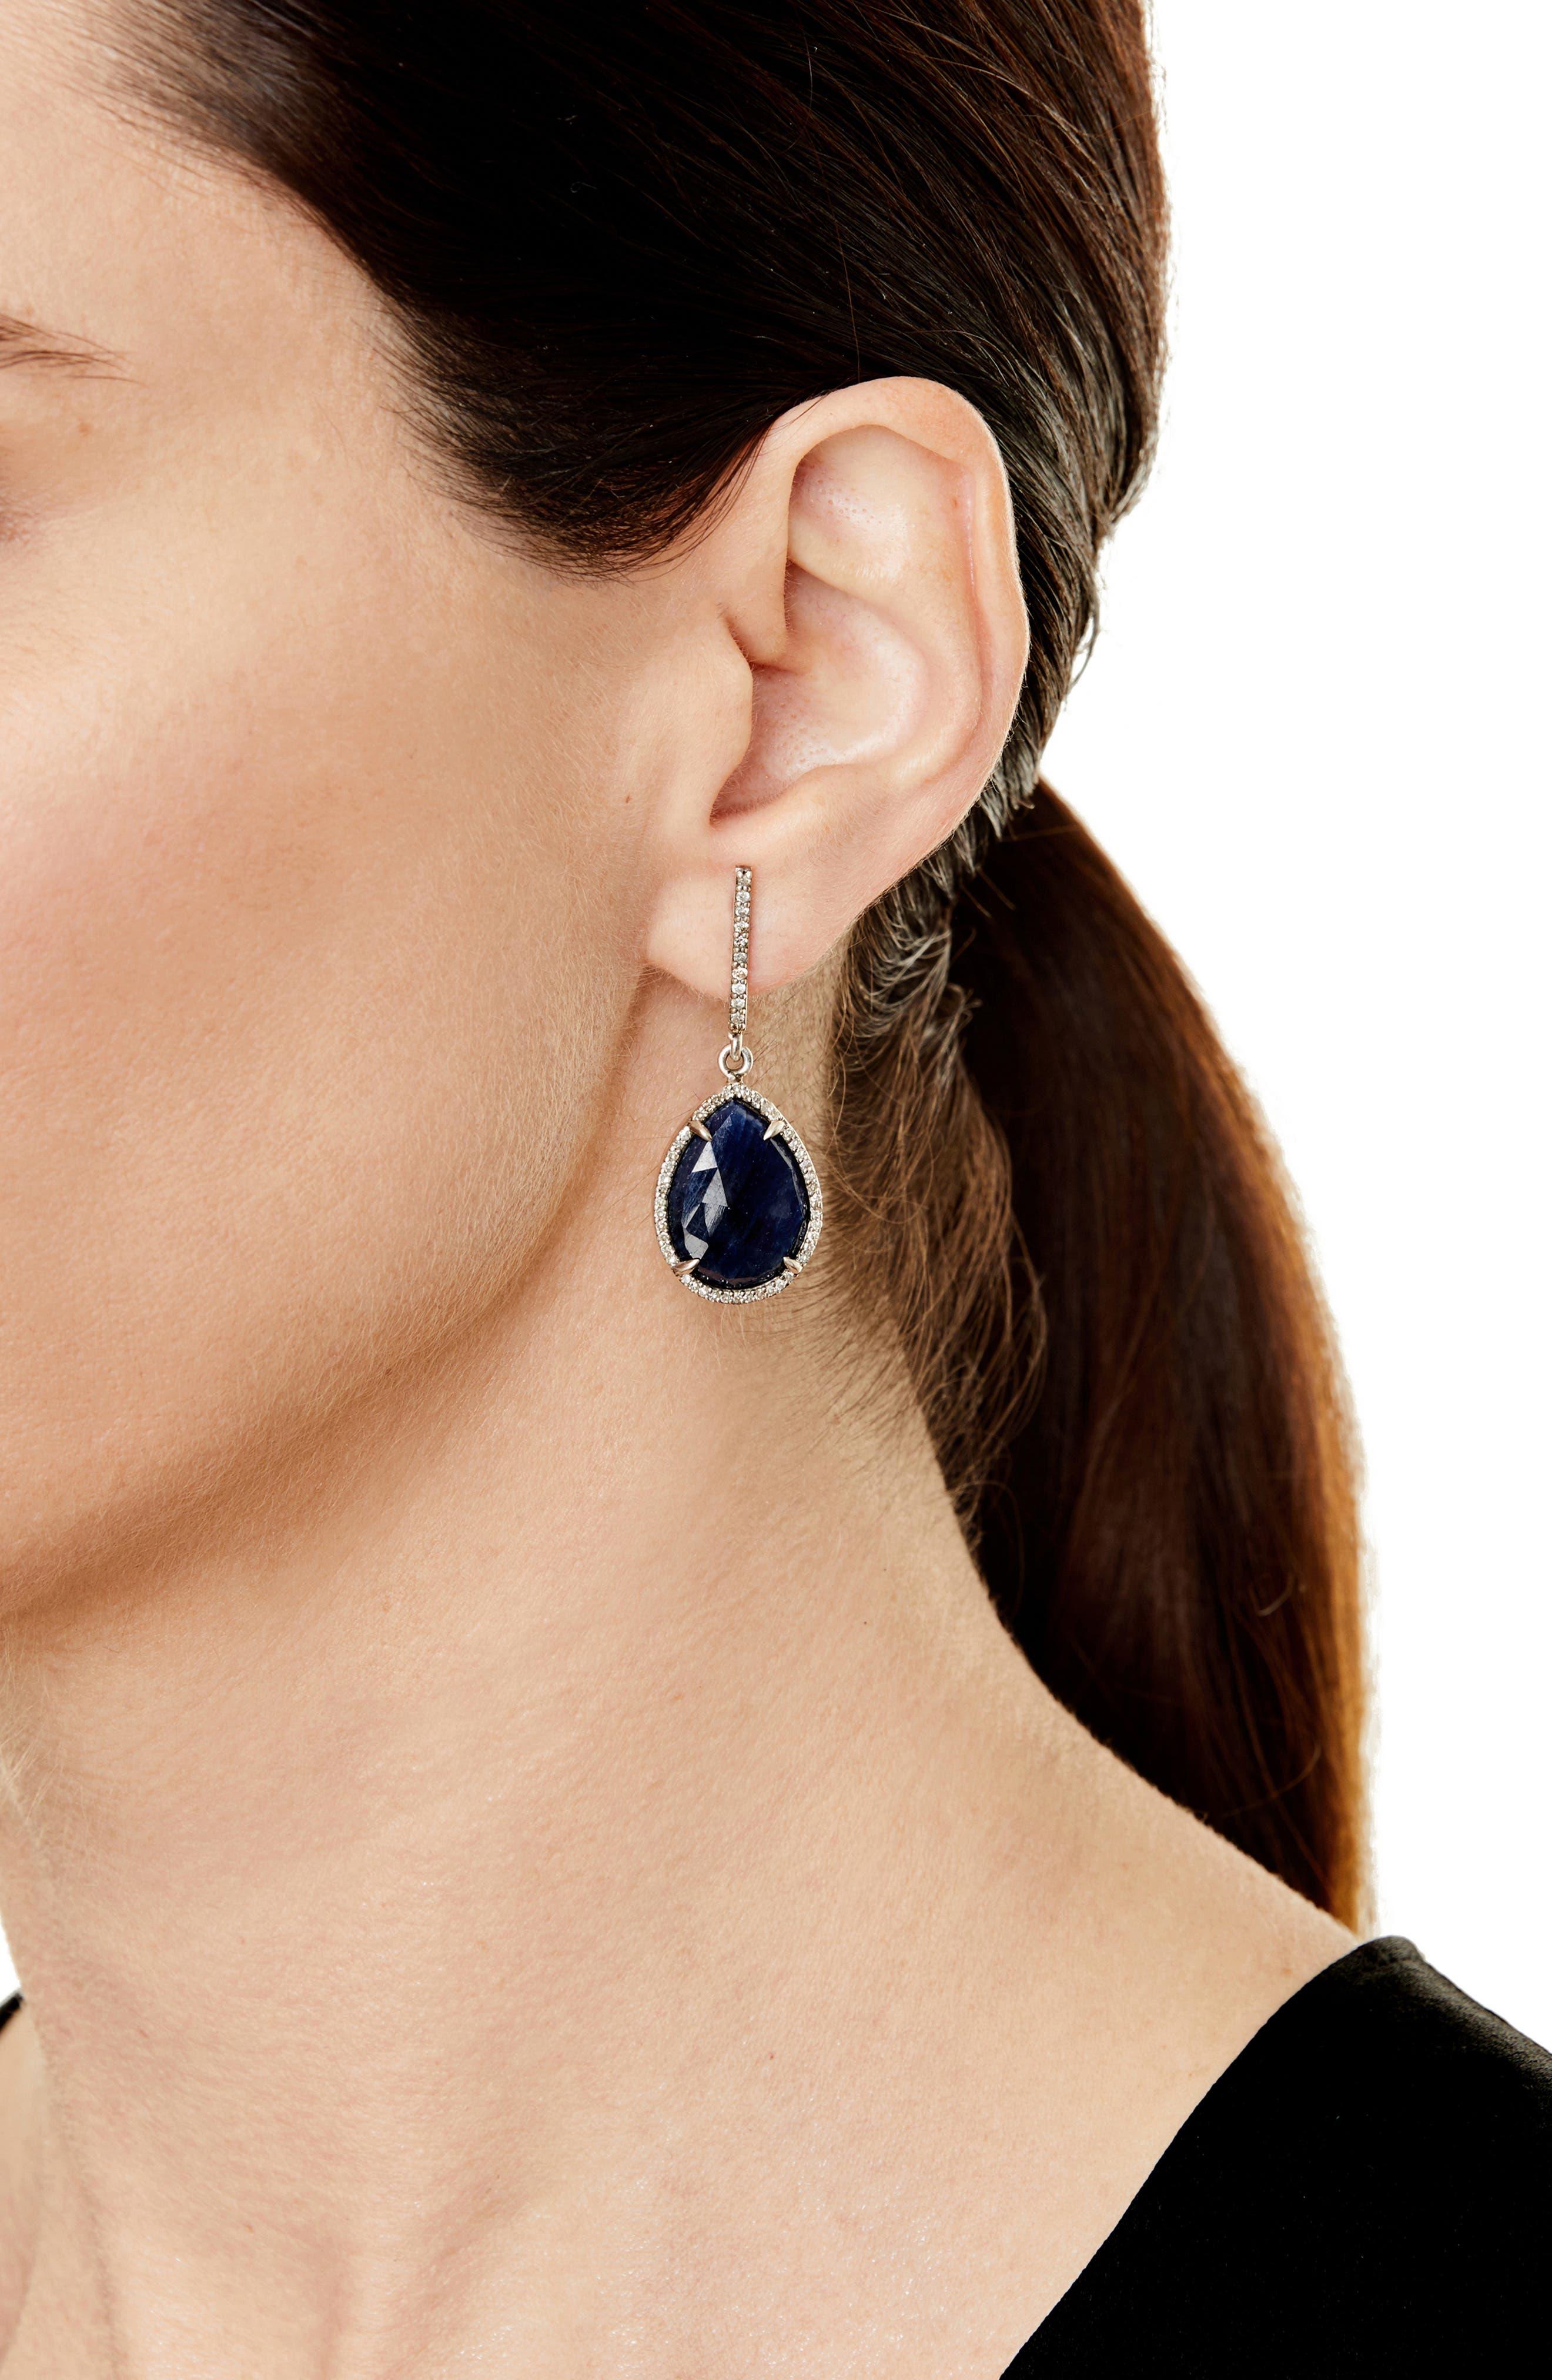 Women's SHERYL LOWE Jewelry | Nordstrom